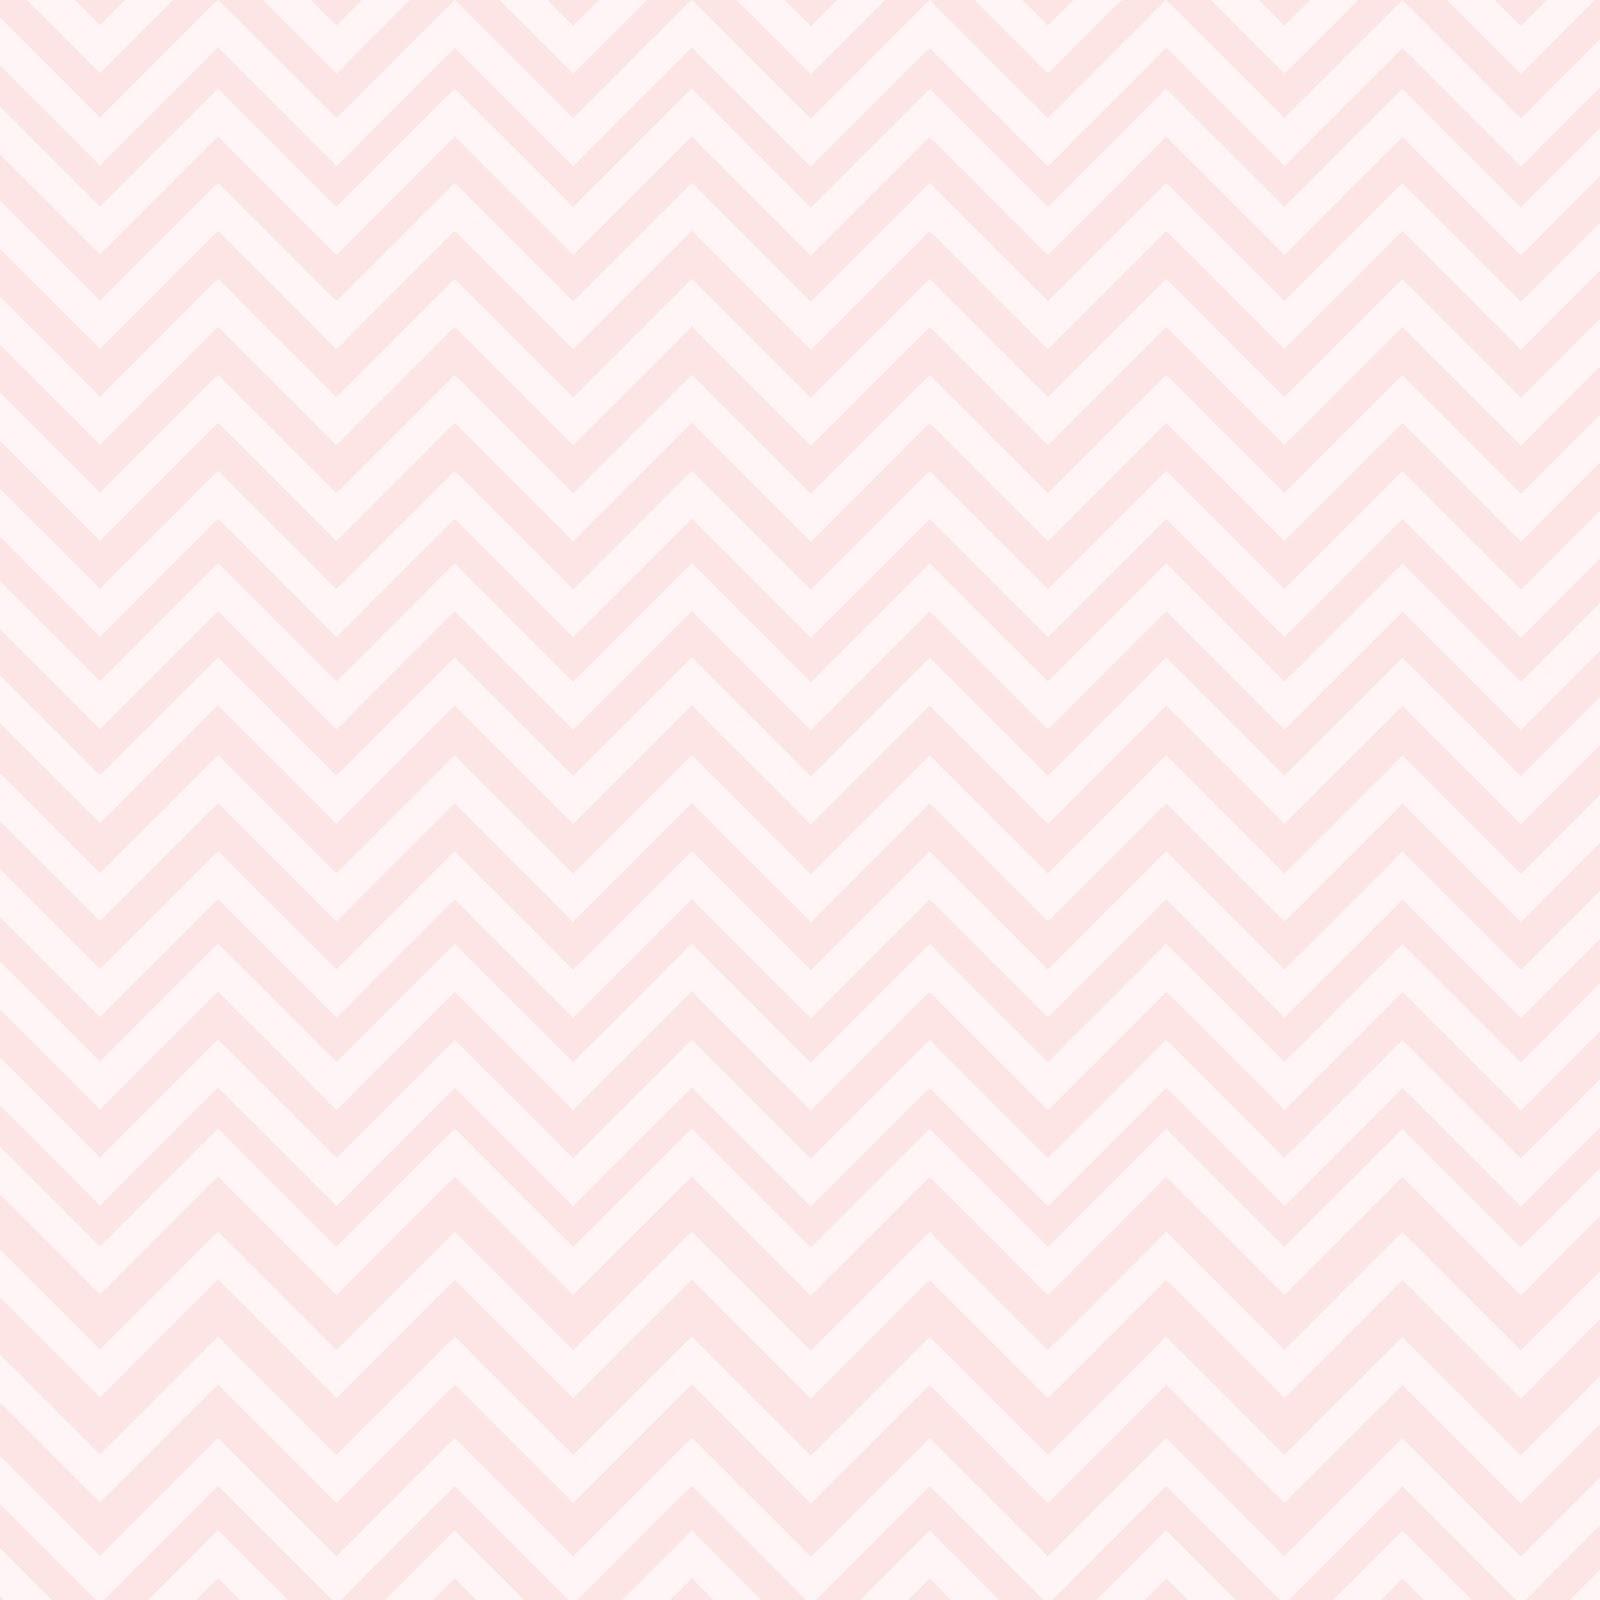 light pink chevron wallpaper - photo #17